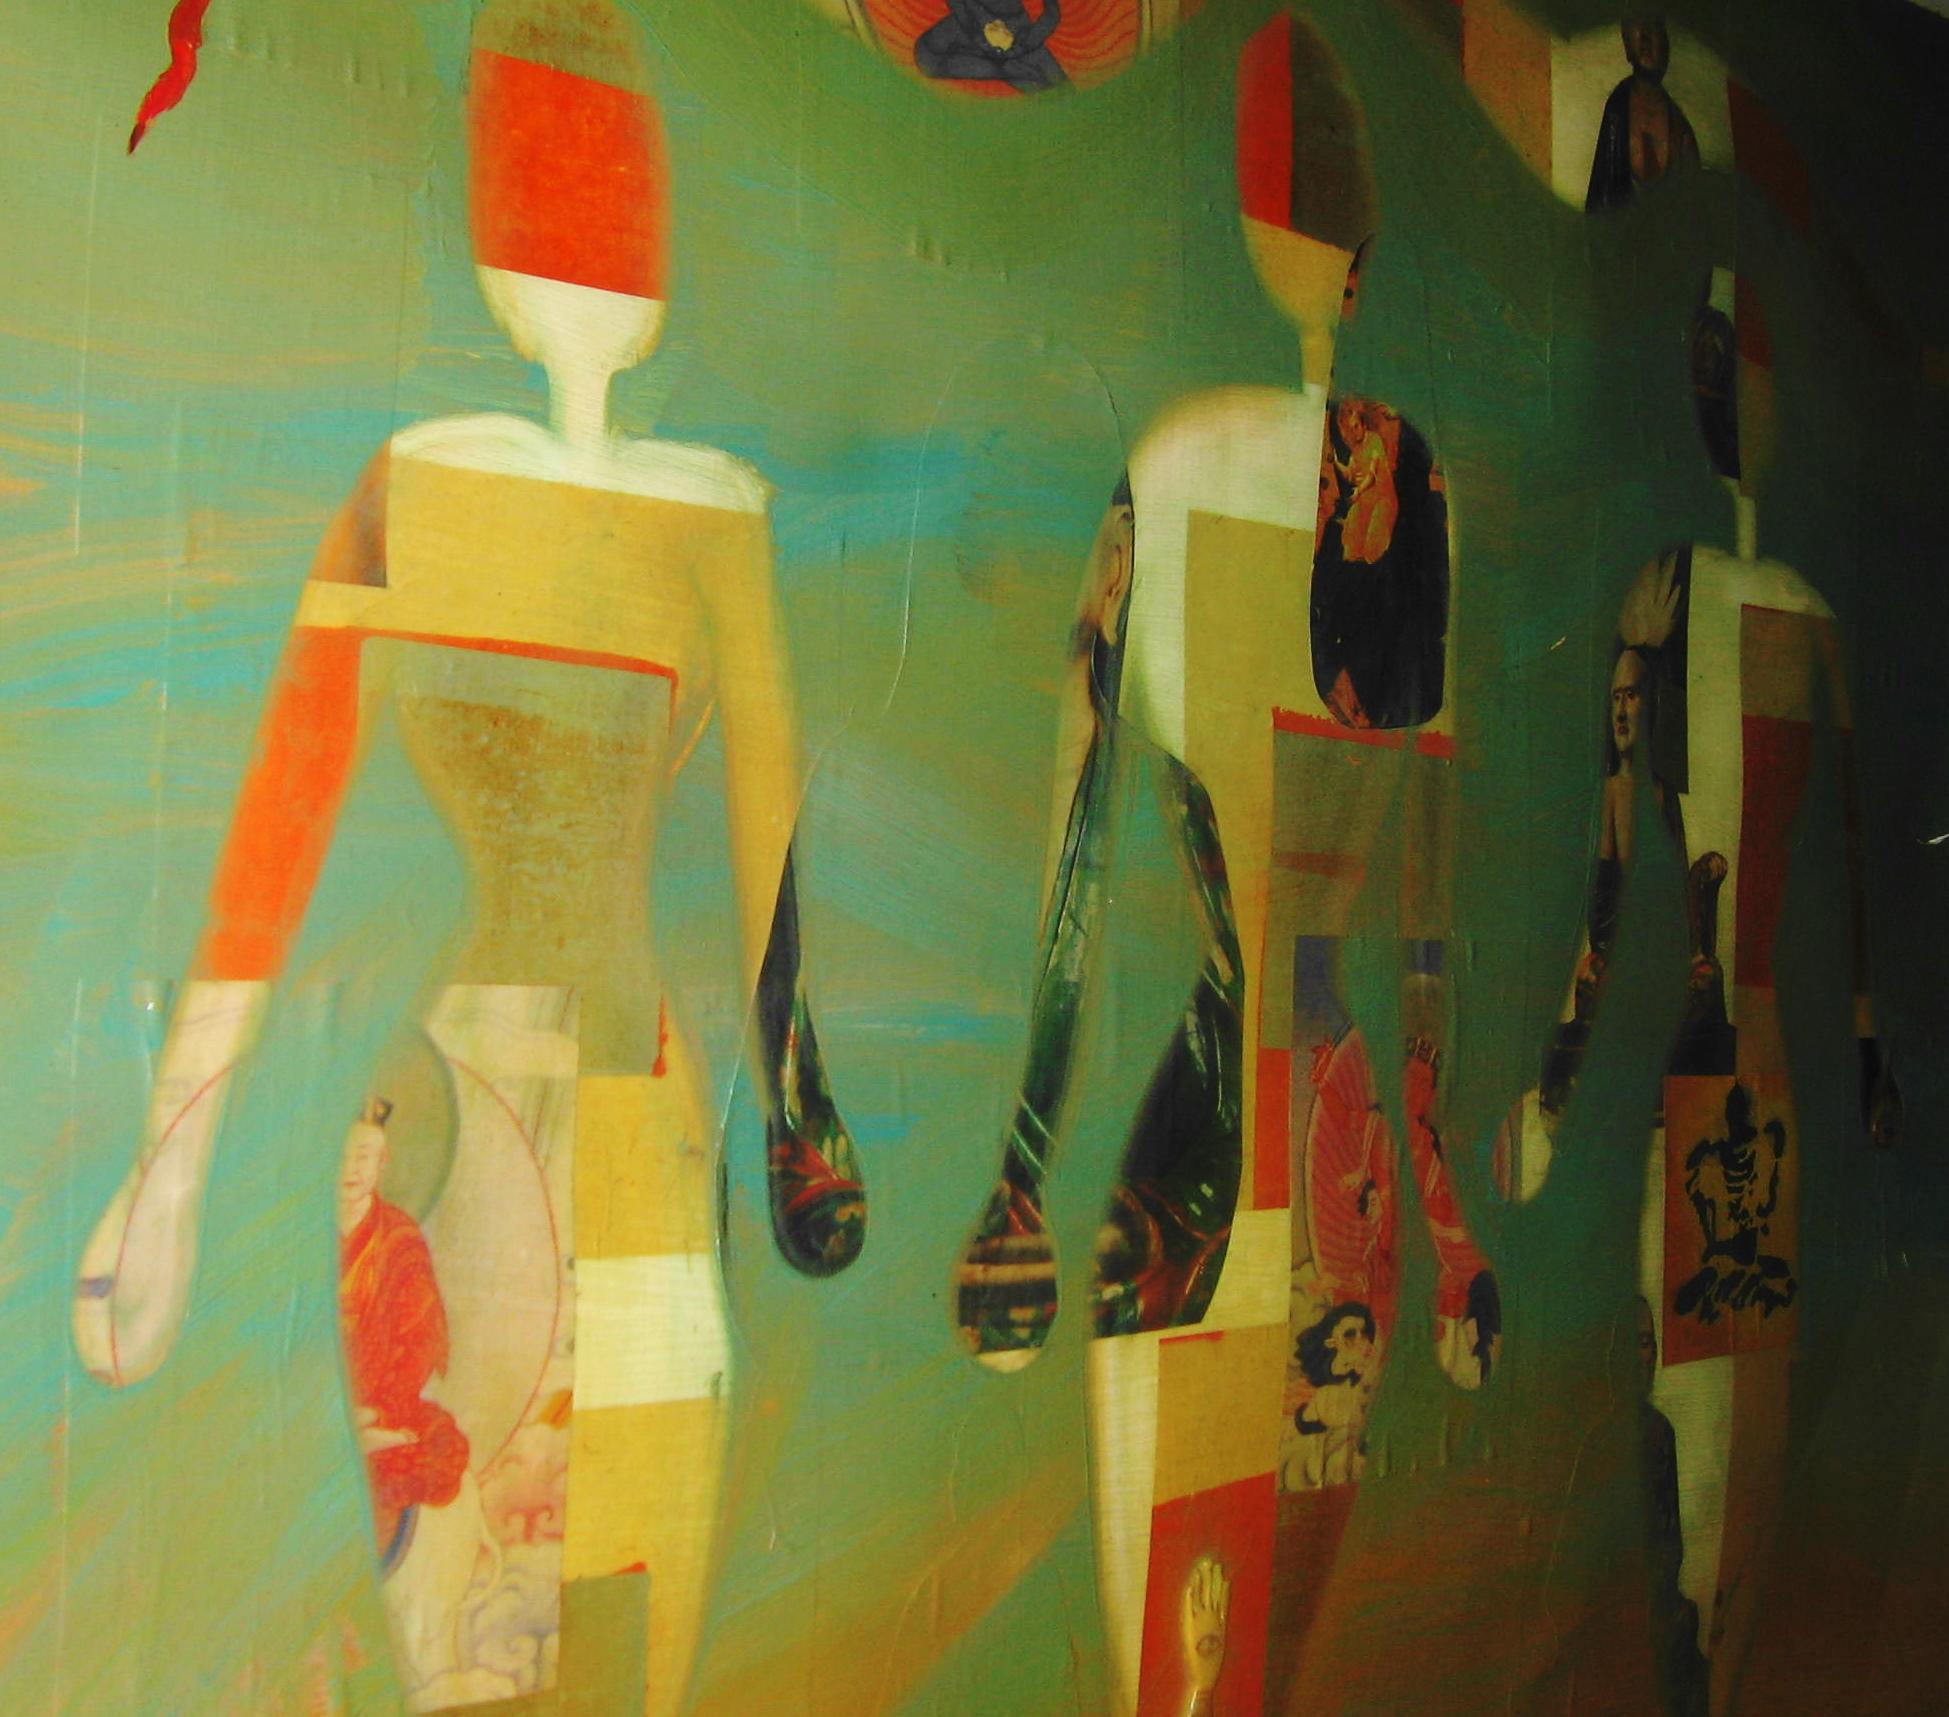 Sherri's Multimedia Painting